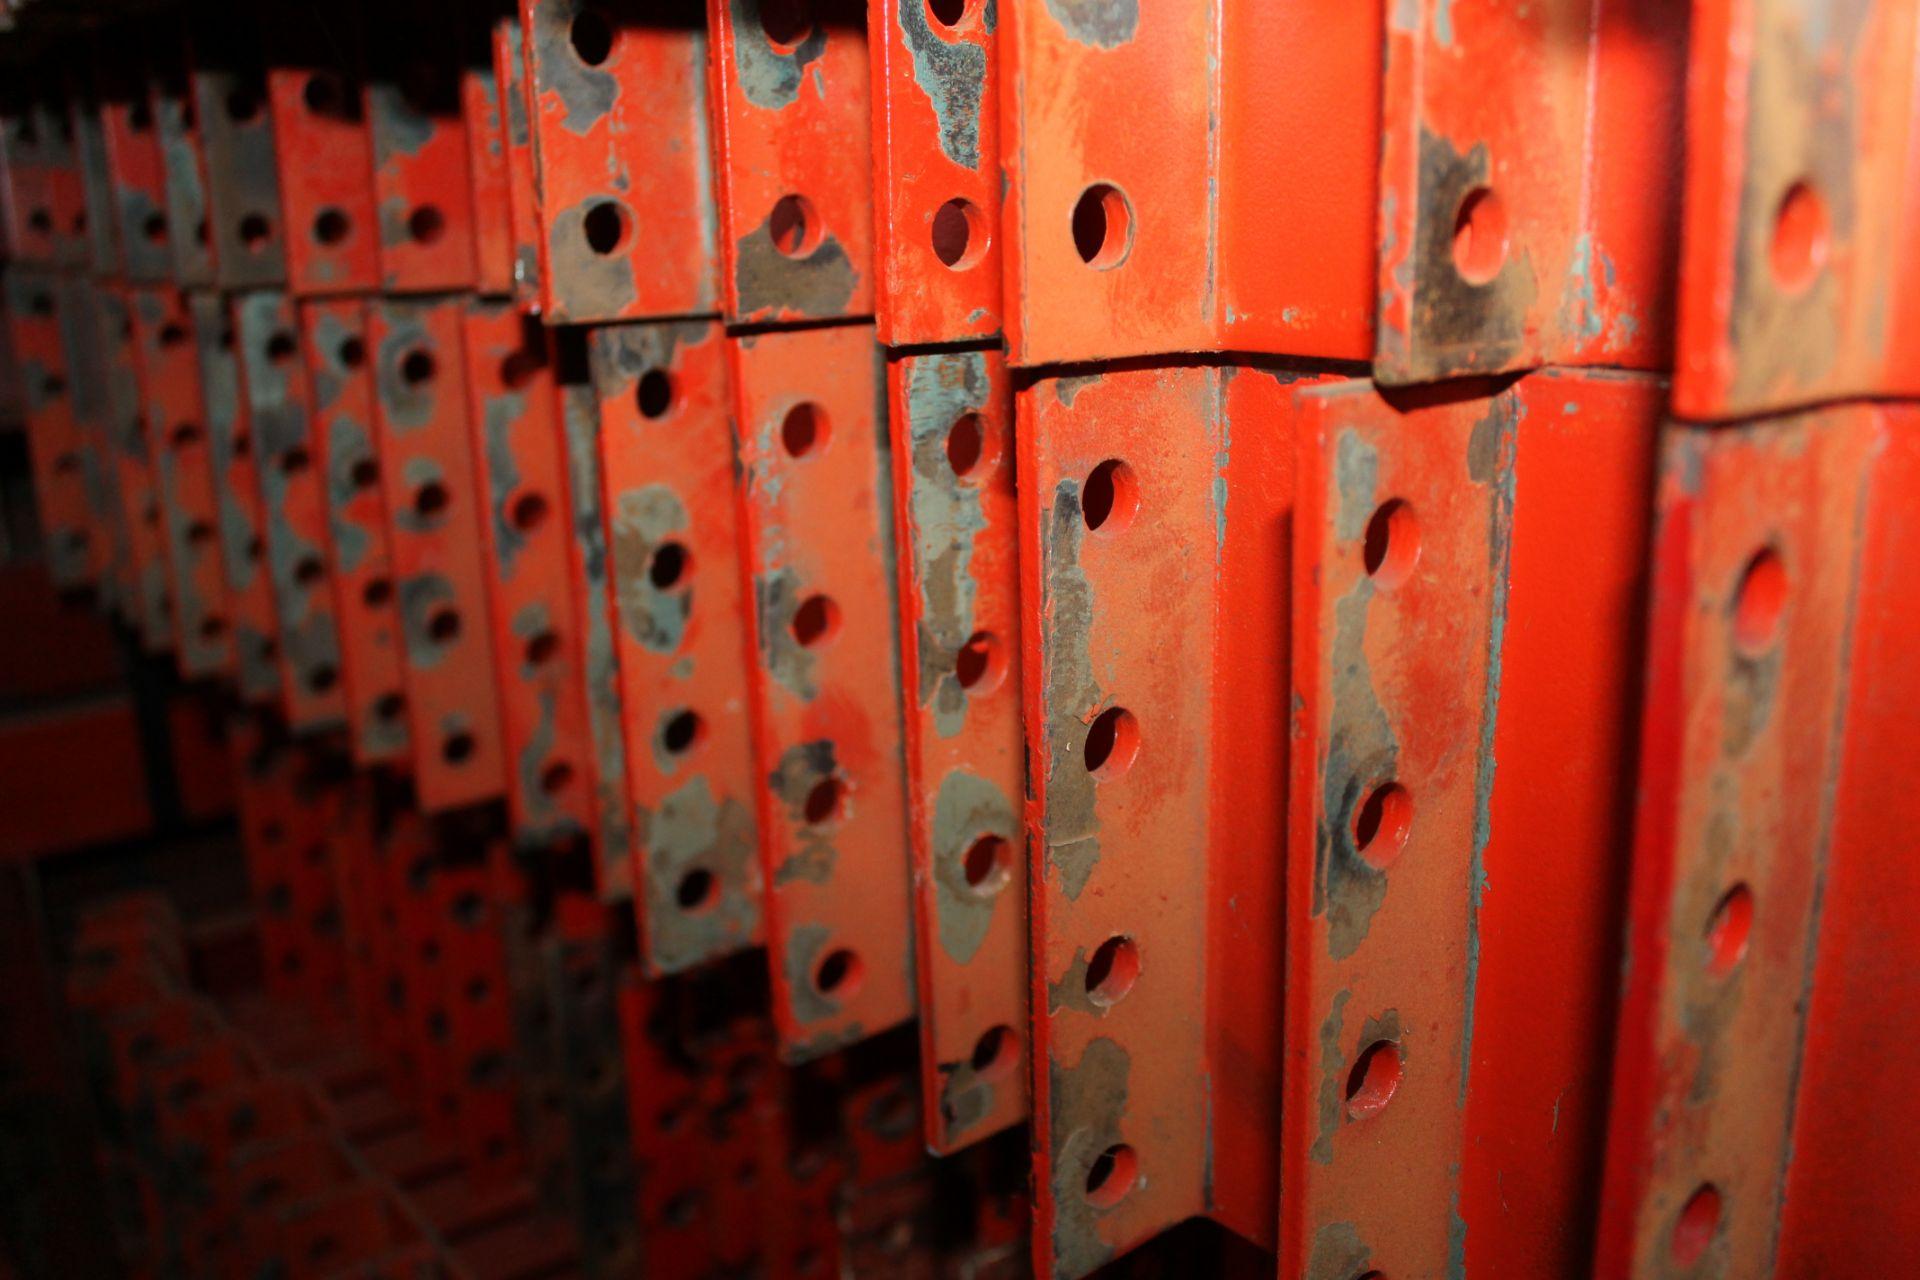 "28 BAYS OF 126""H X 42""D X 102""L STRUCTURAL PALLET RACKS - Image 4 of 4"